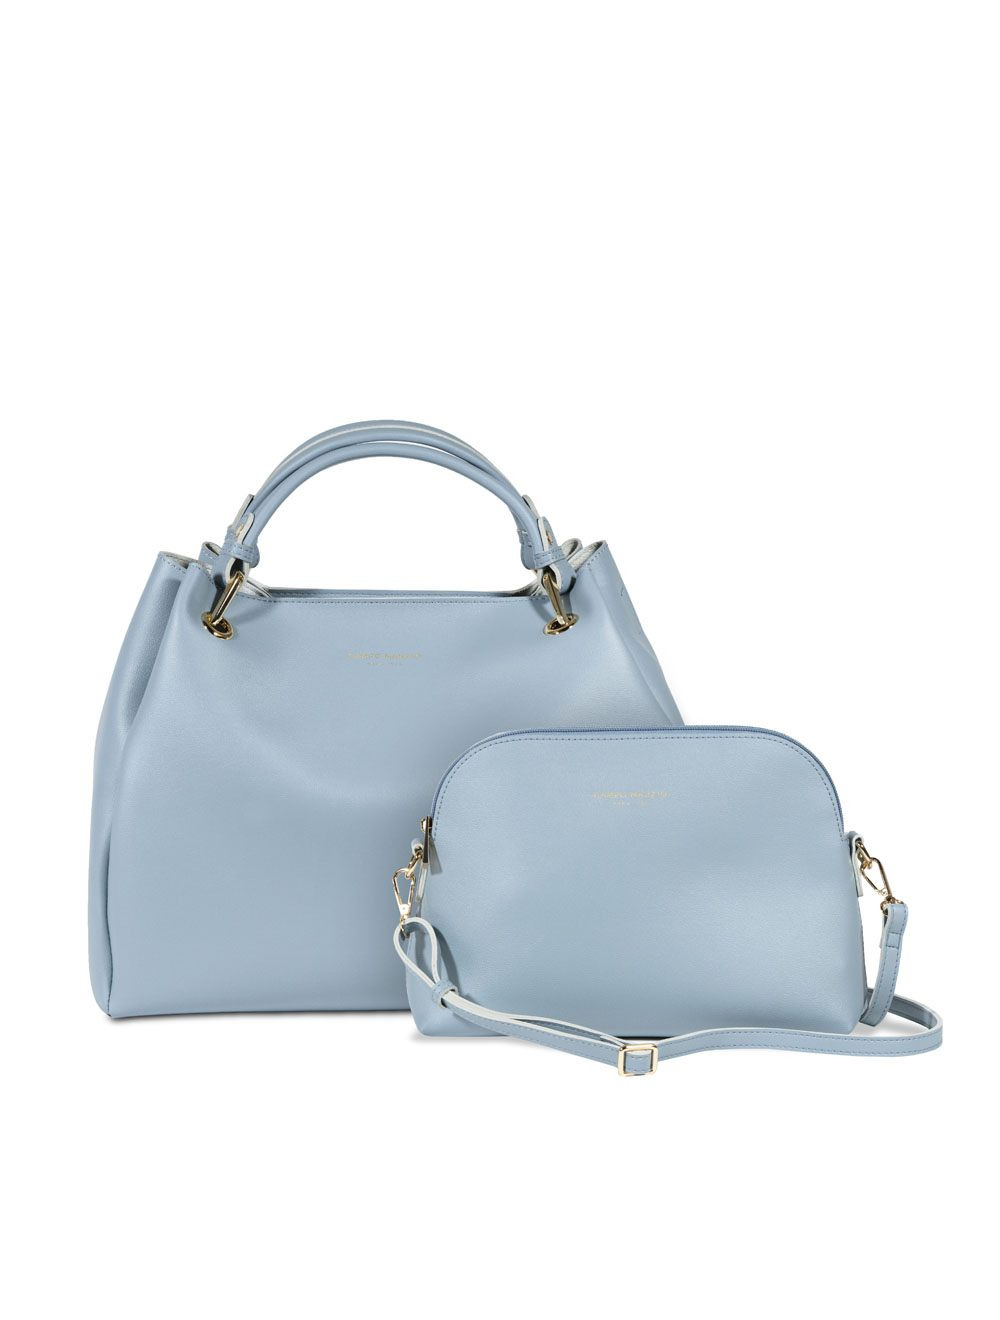 Handbag With Inner Bag